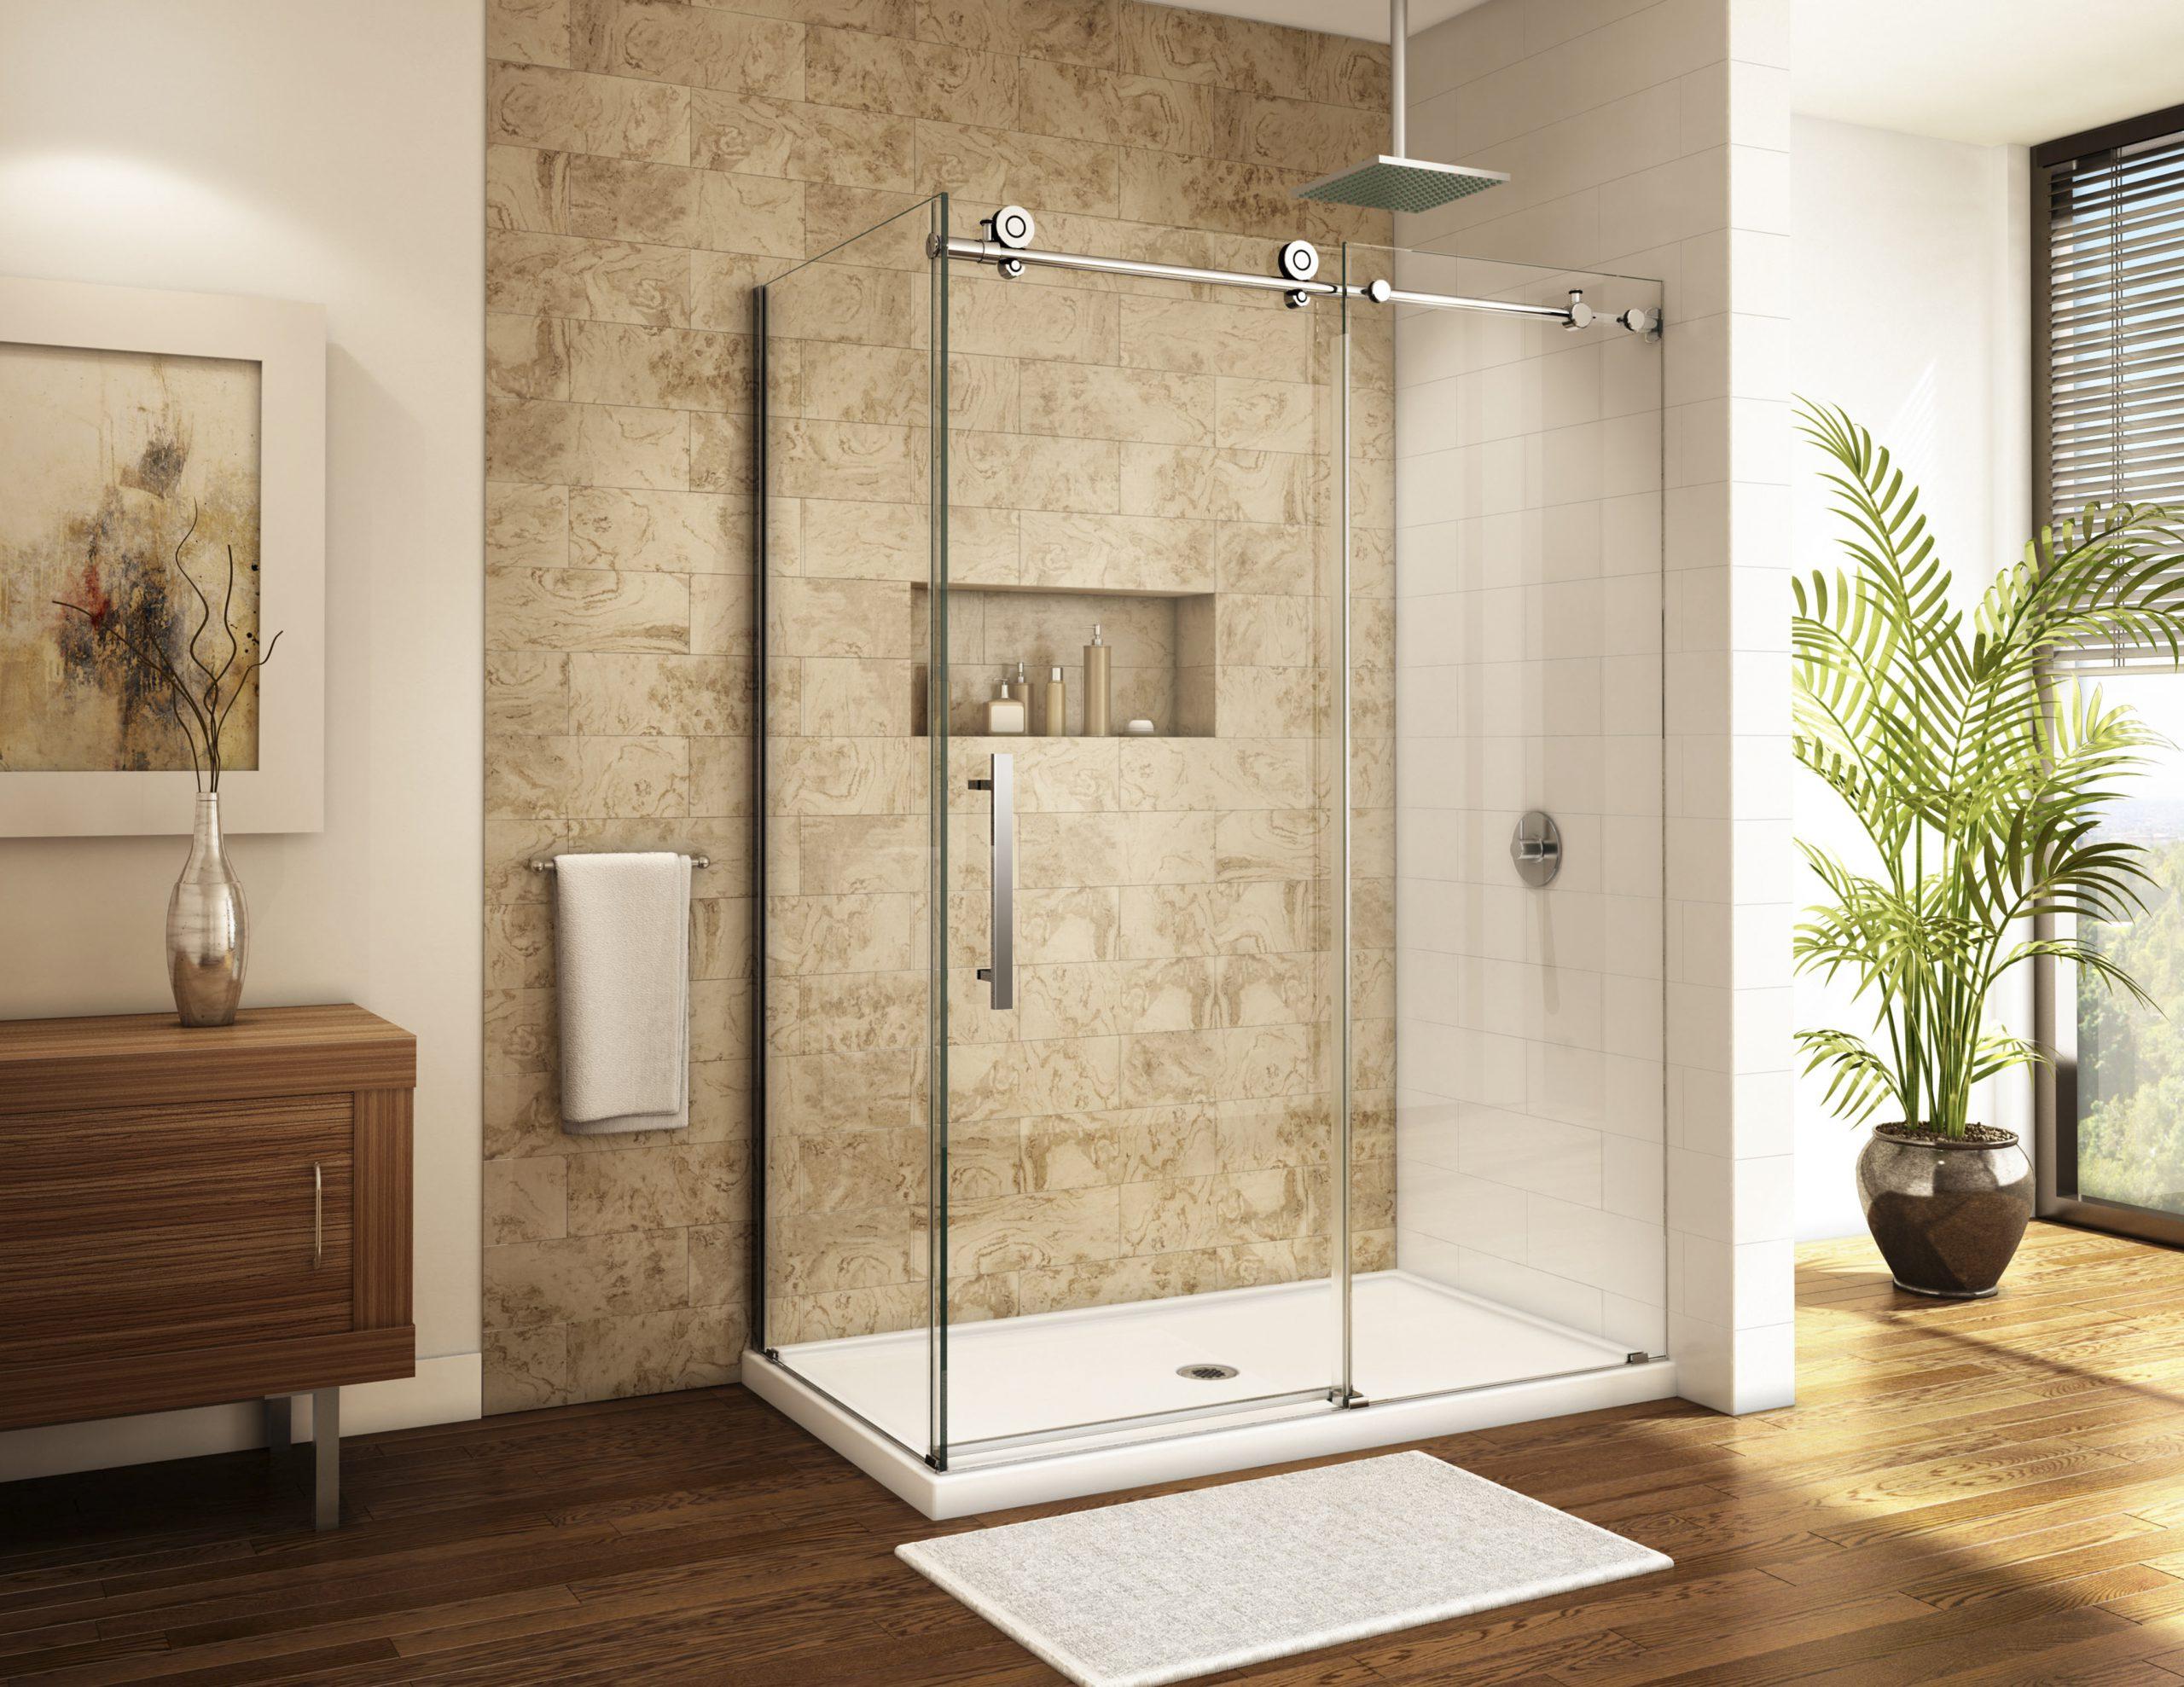 frameless-shower-doors-chicago-shower-enclosures-chicago